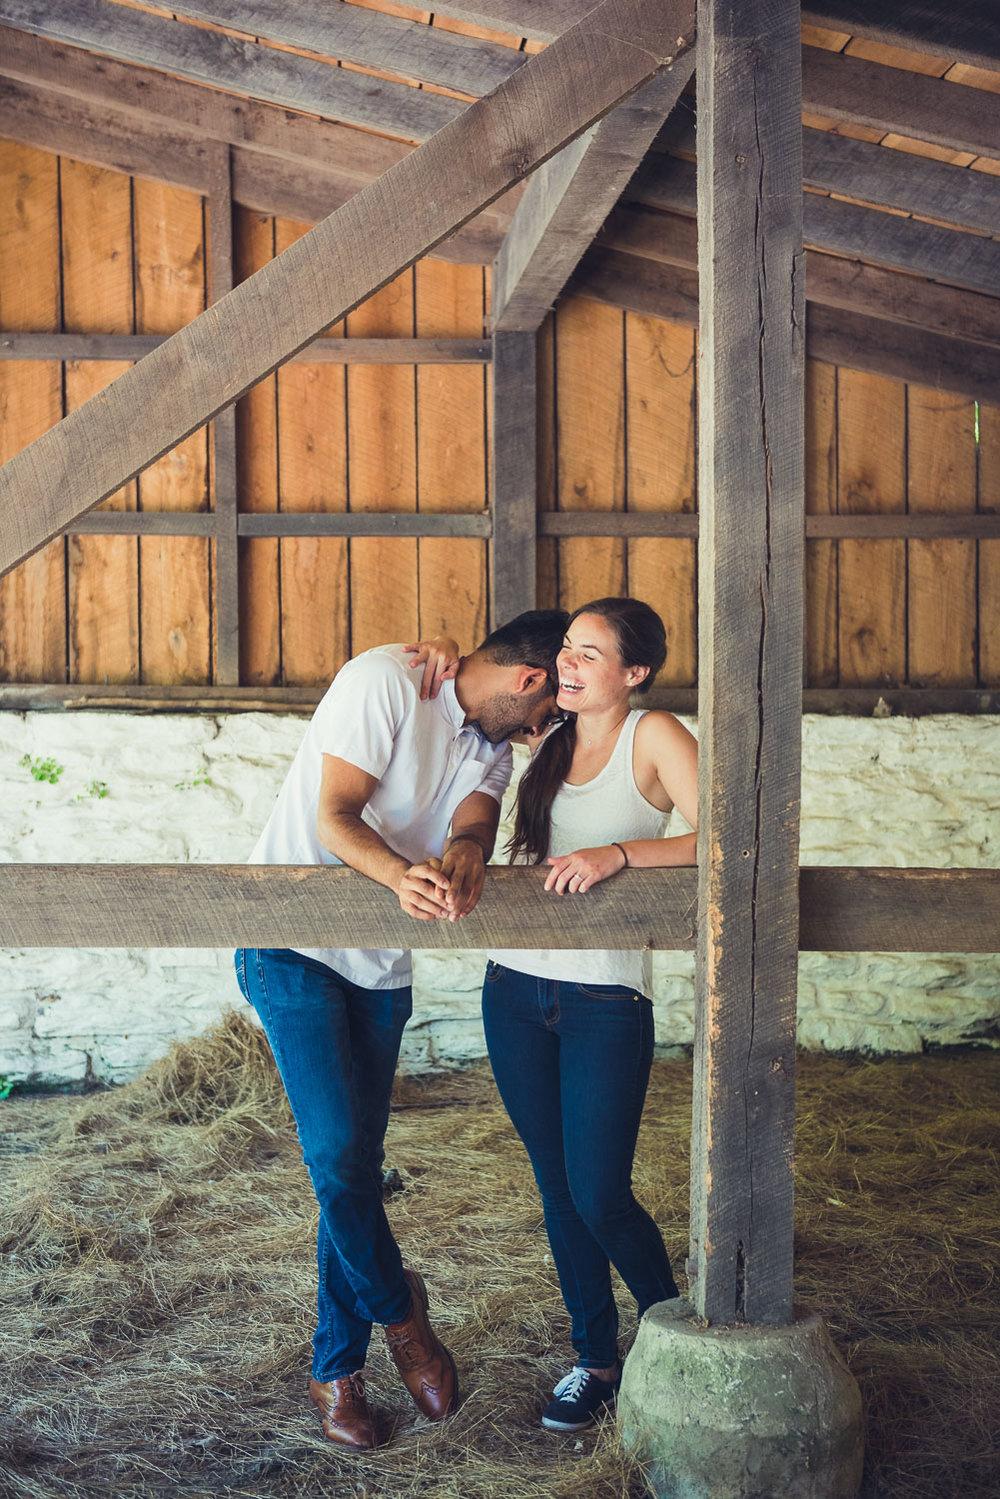 20170708 - Tiffany Pranshu Engagement LR-5.jpg